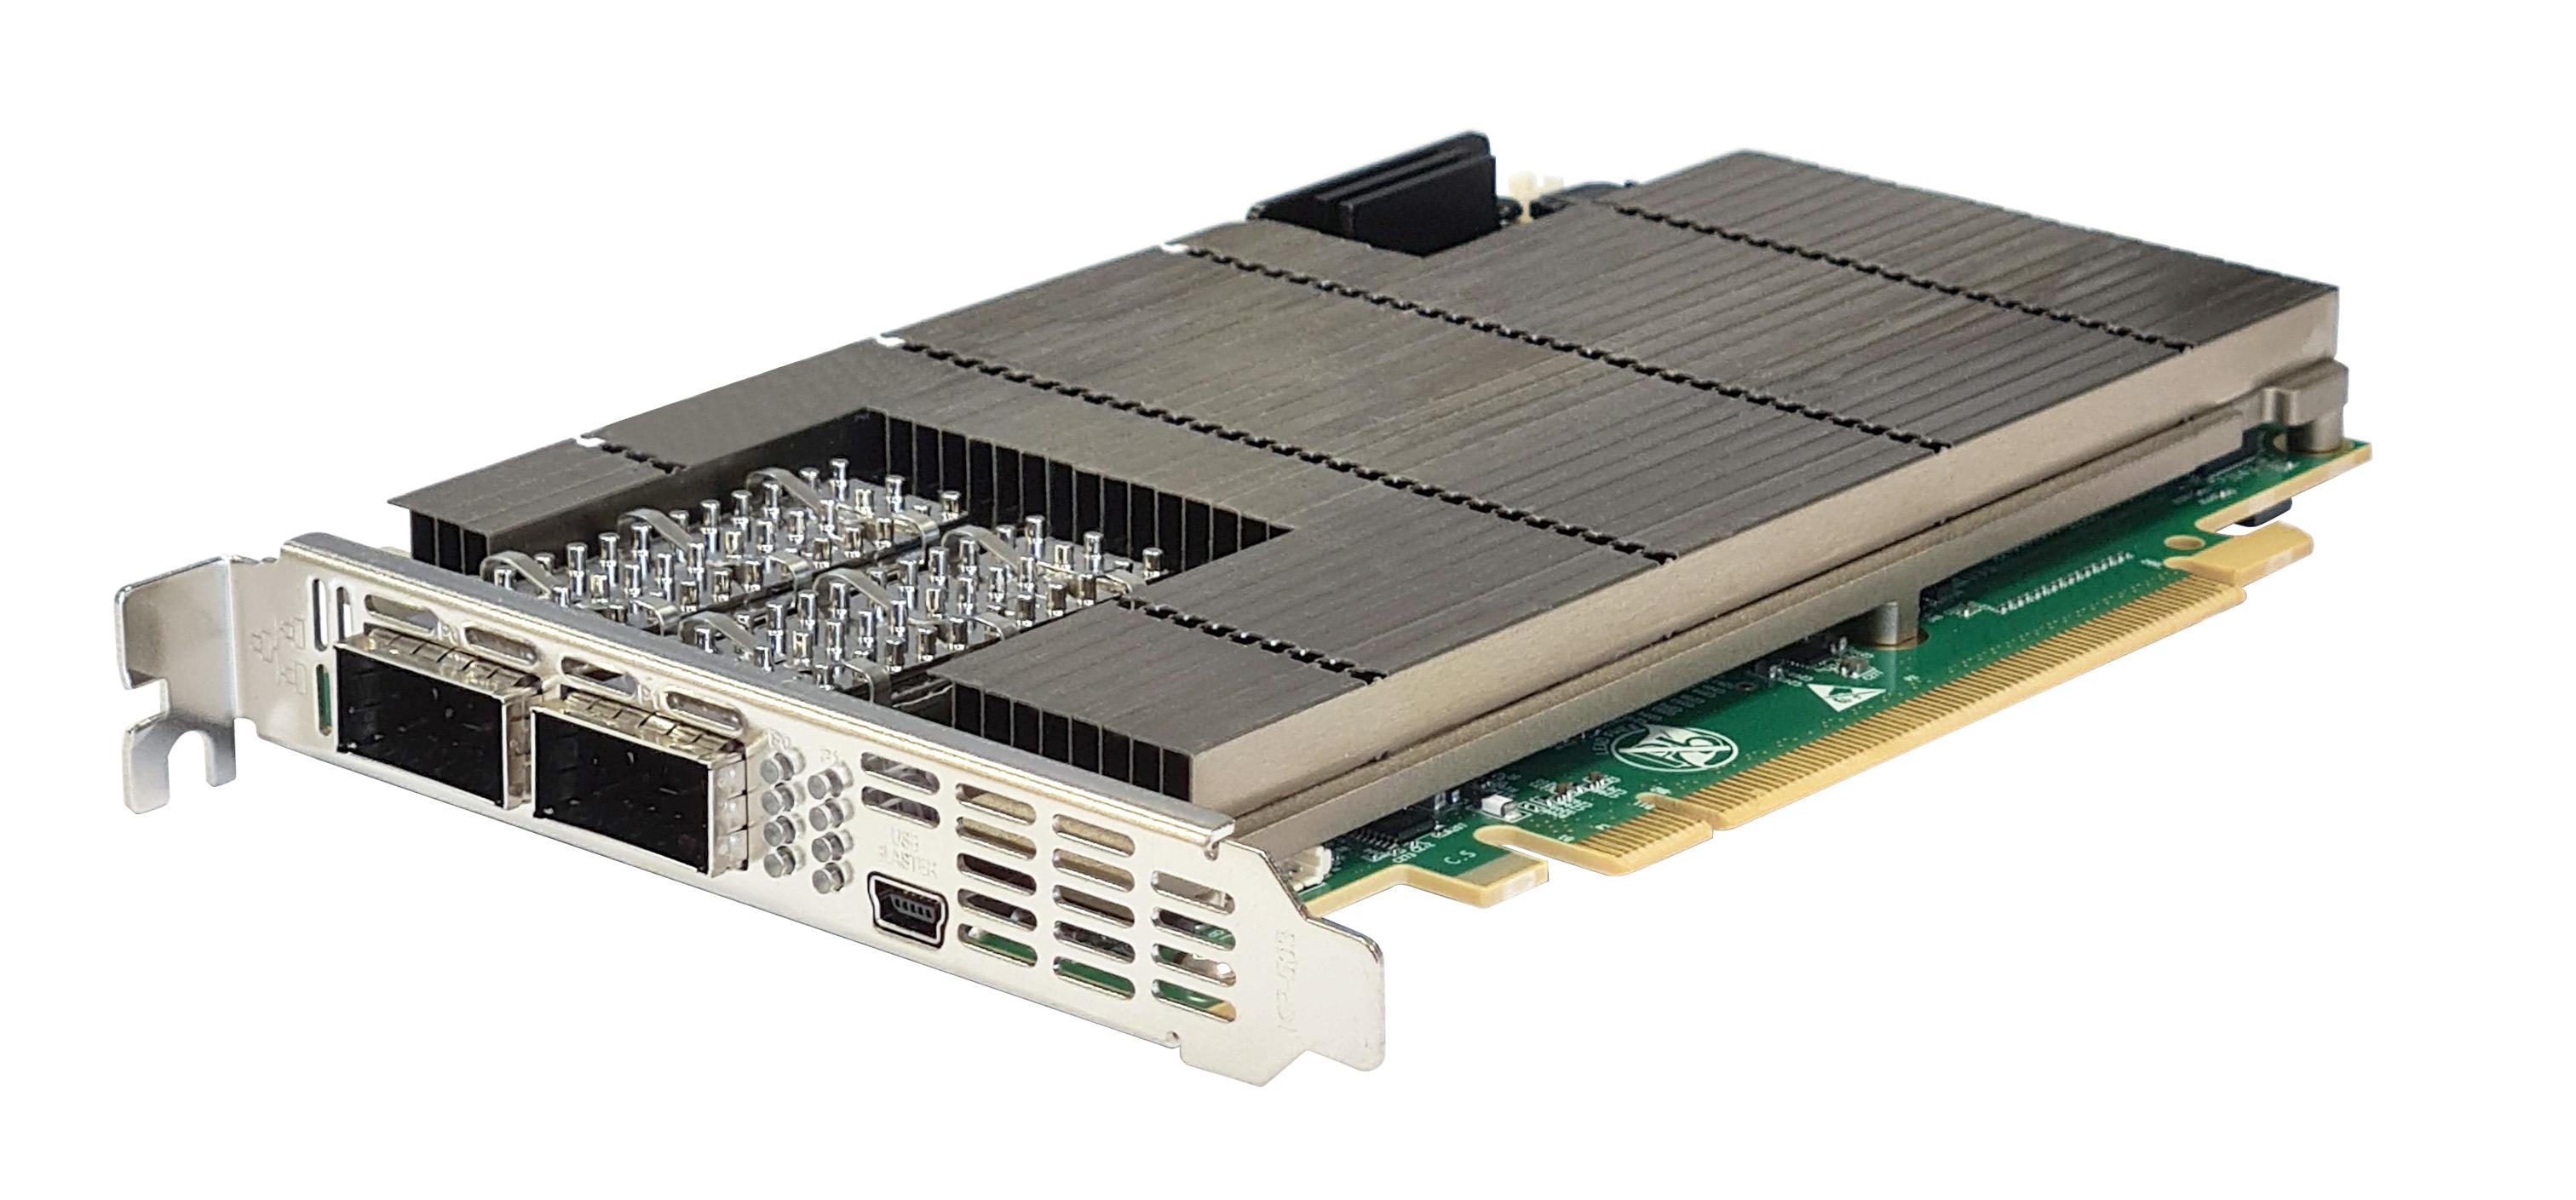 FB1C1XLG@A10T1150ENV FPGA Card